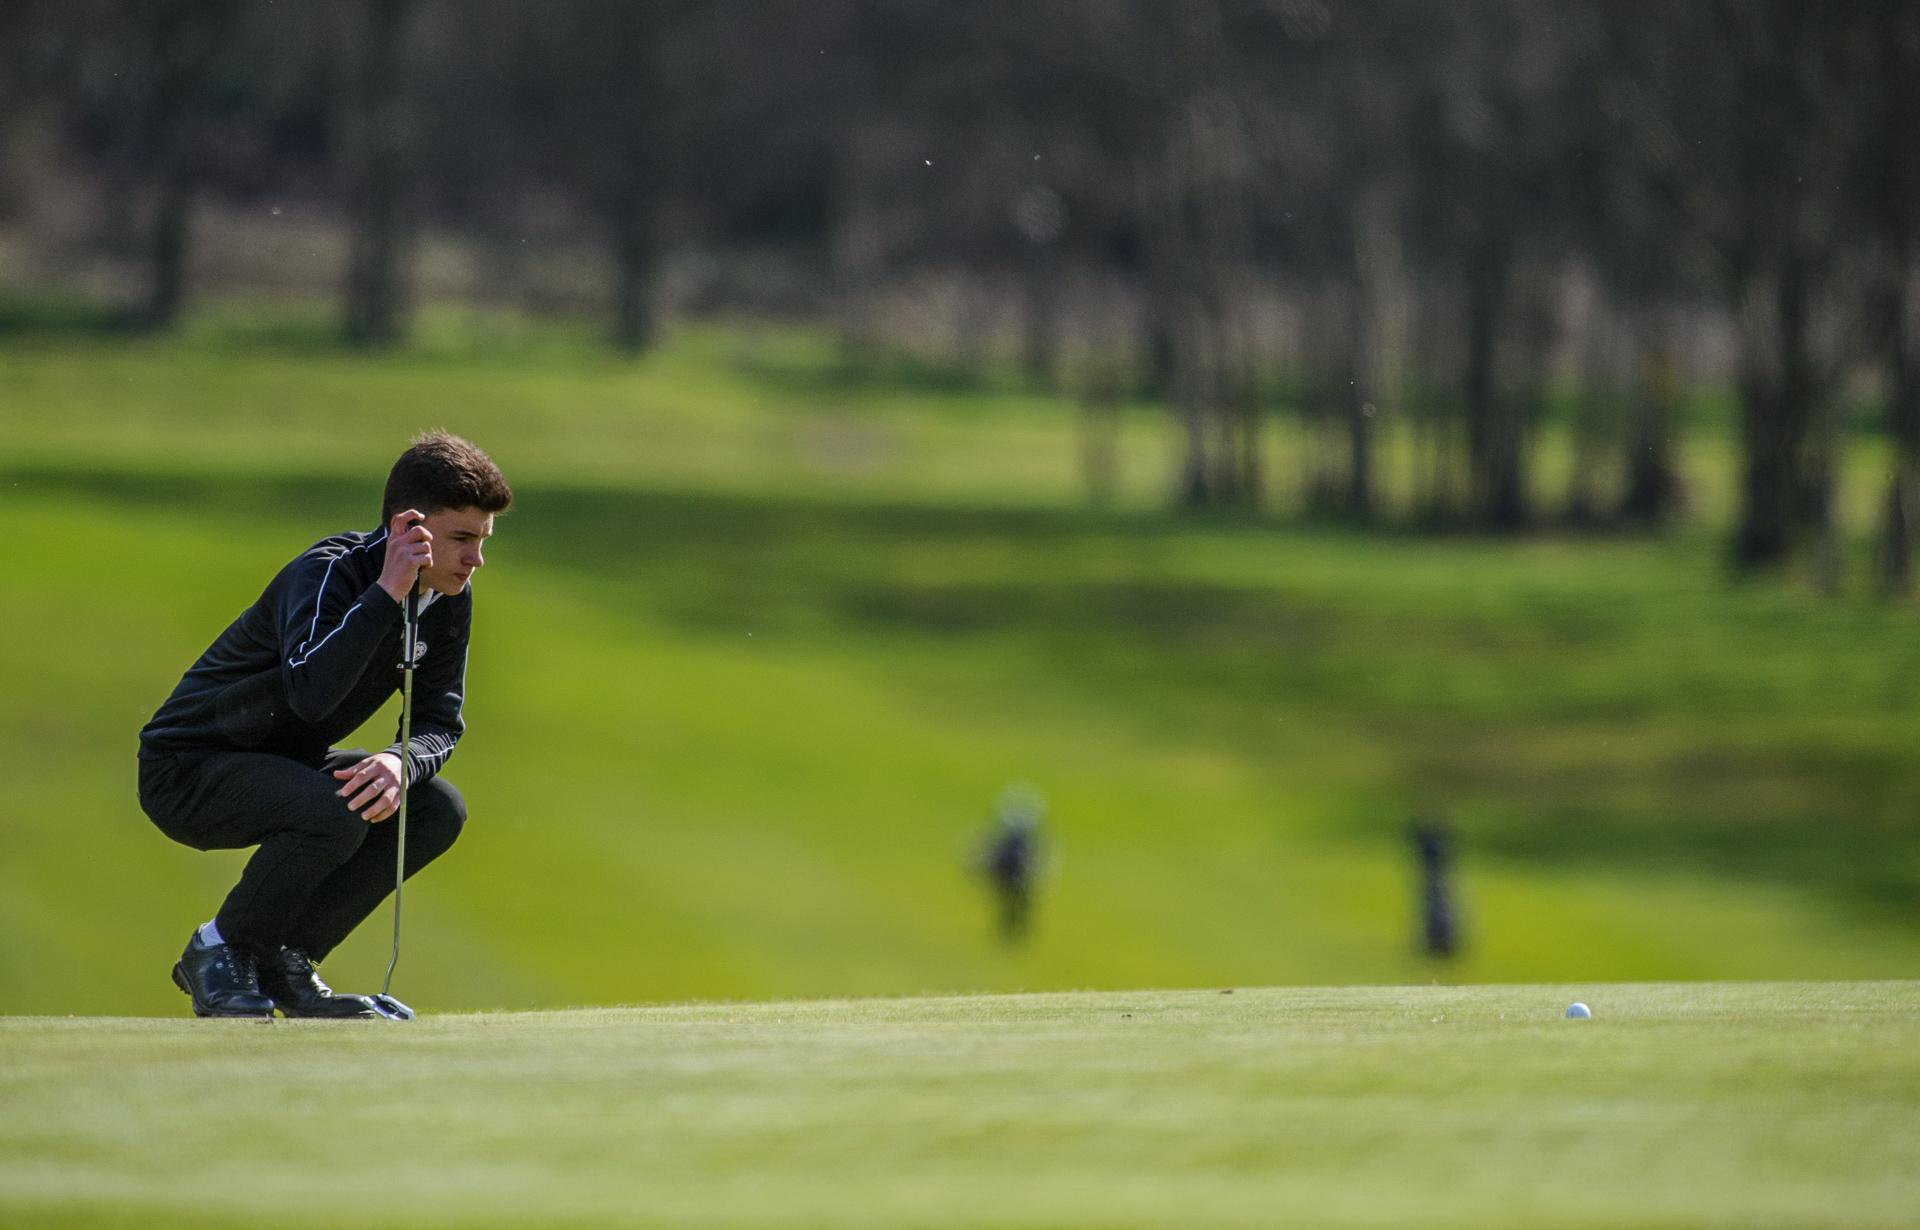 Kevindiss.com golf course photography Hawkstone Park golf course-2655.jpg